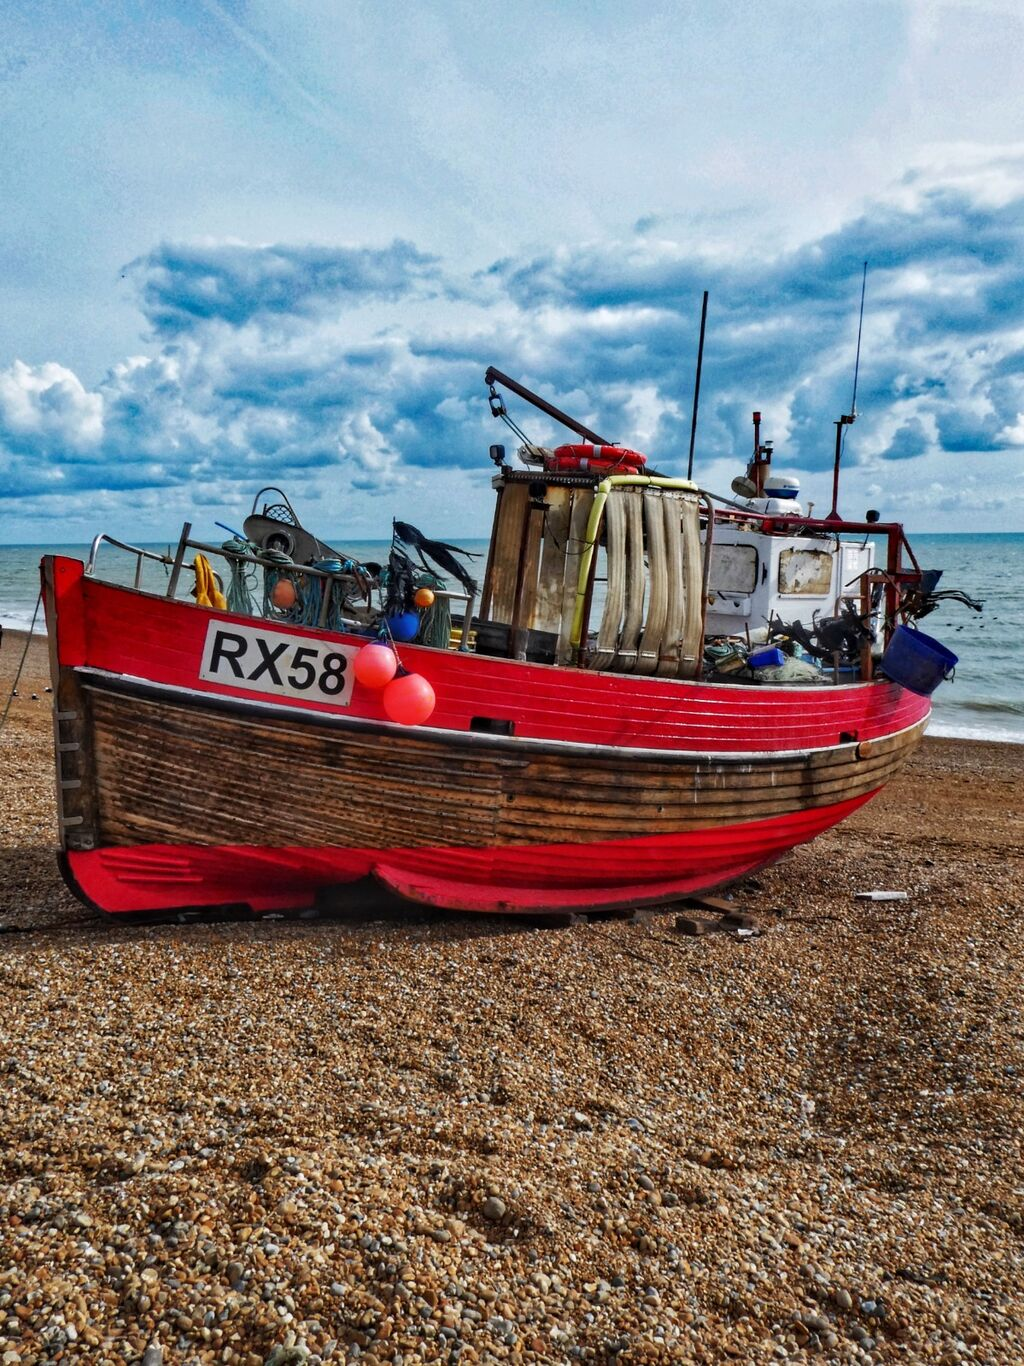 RX58 at Hastings